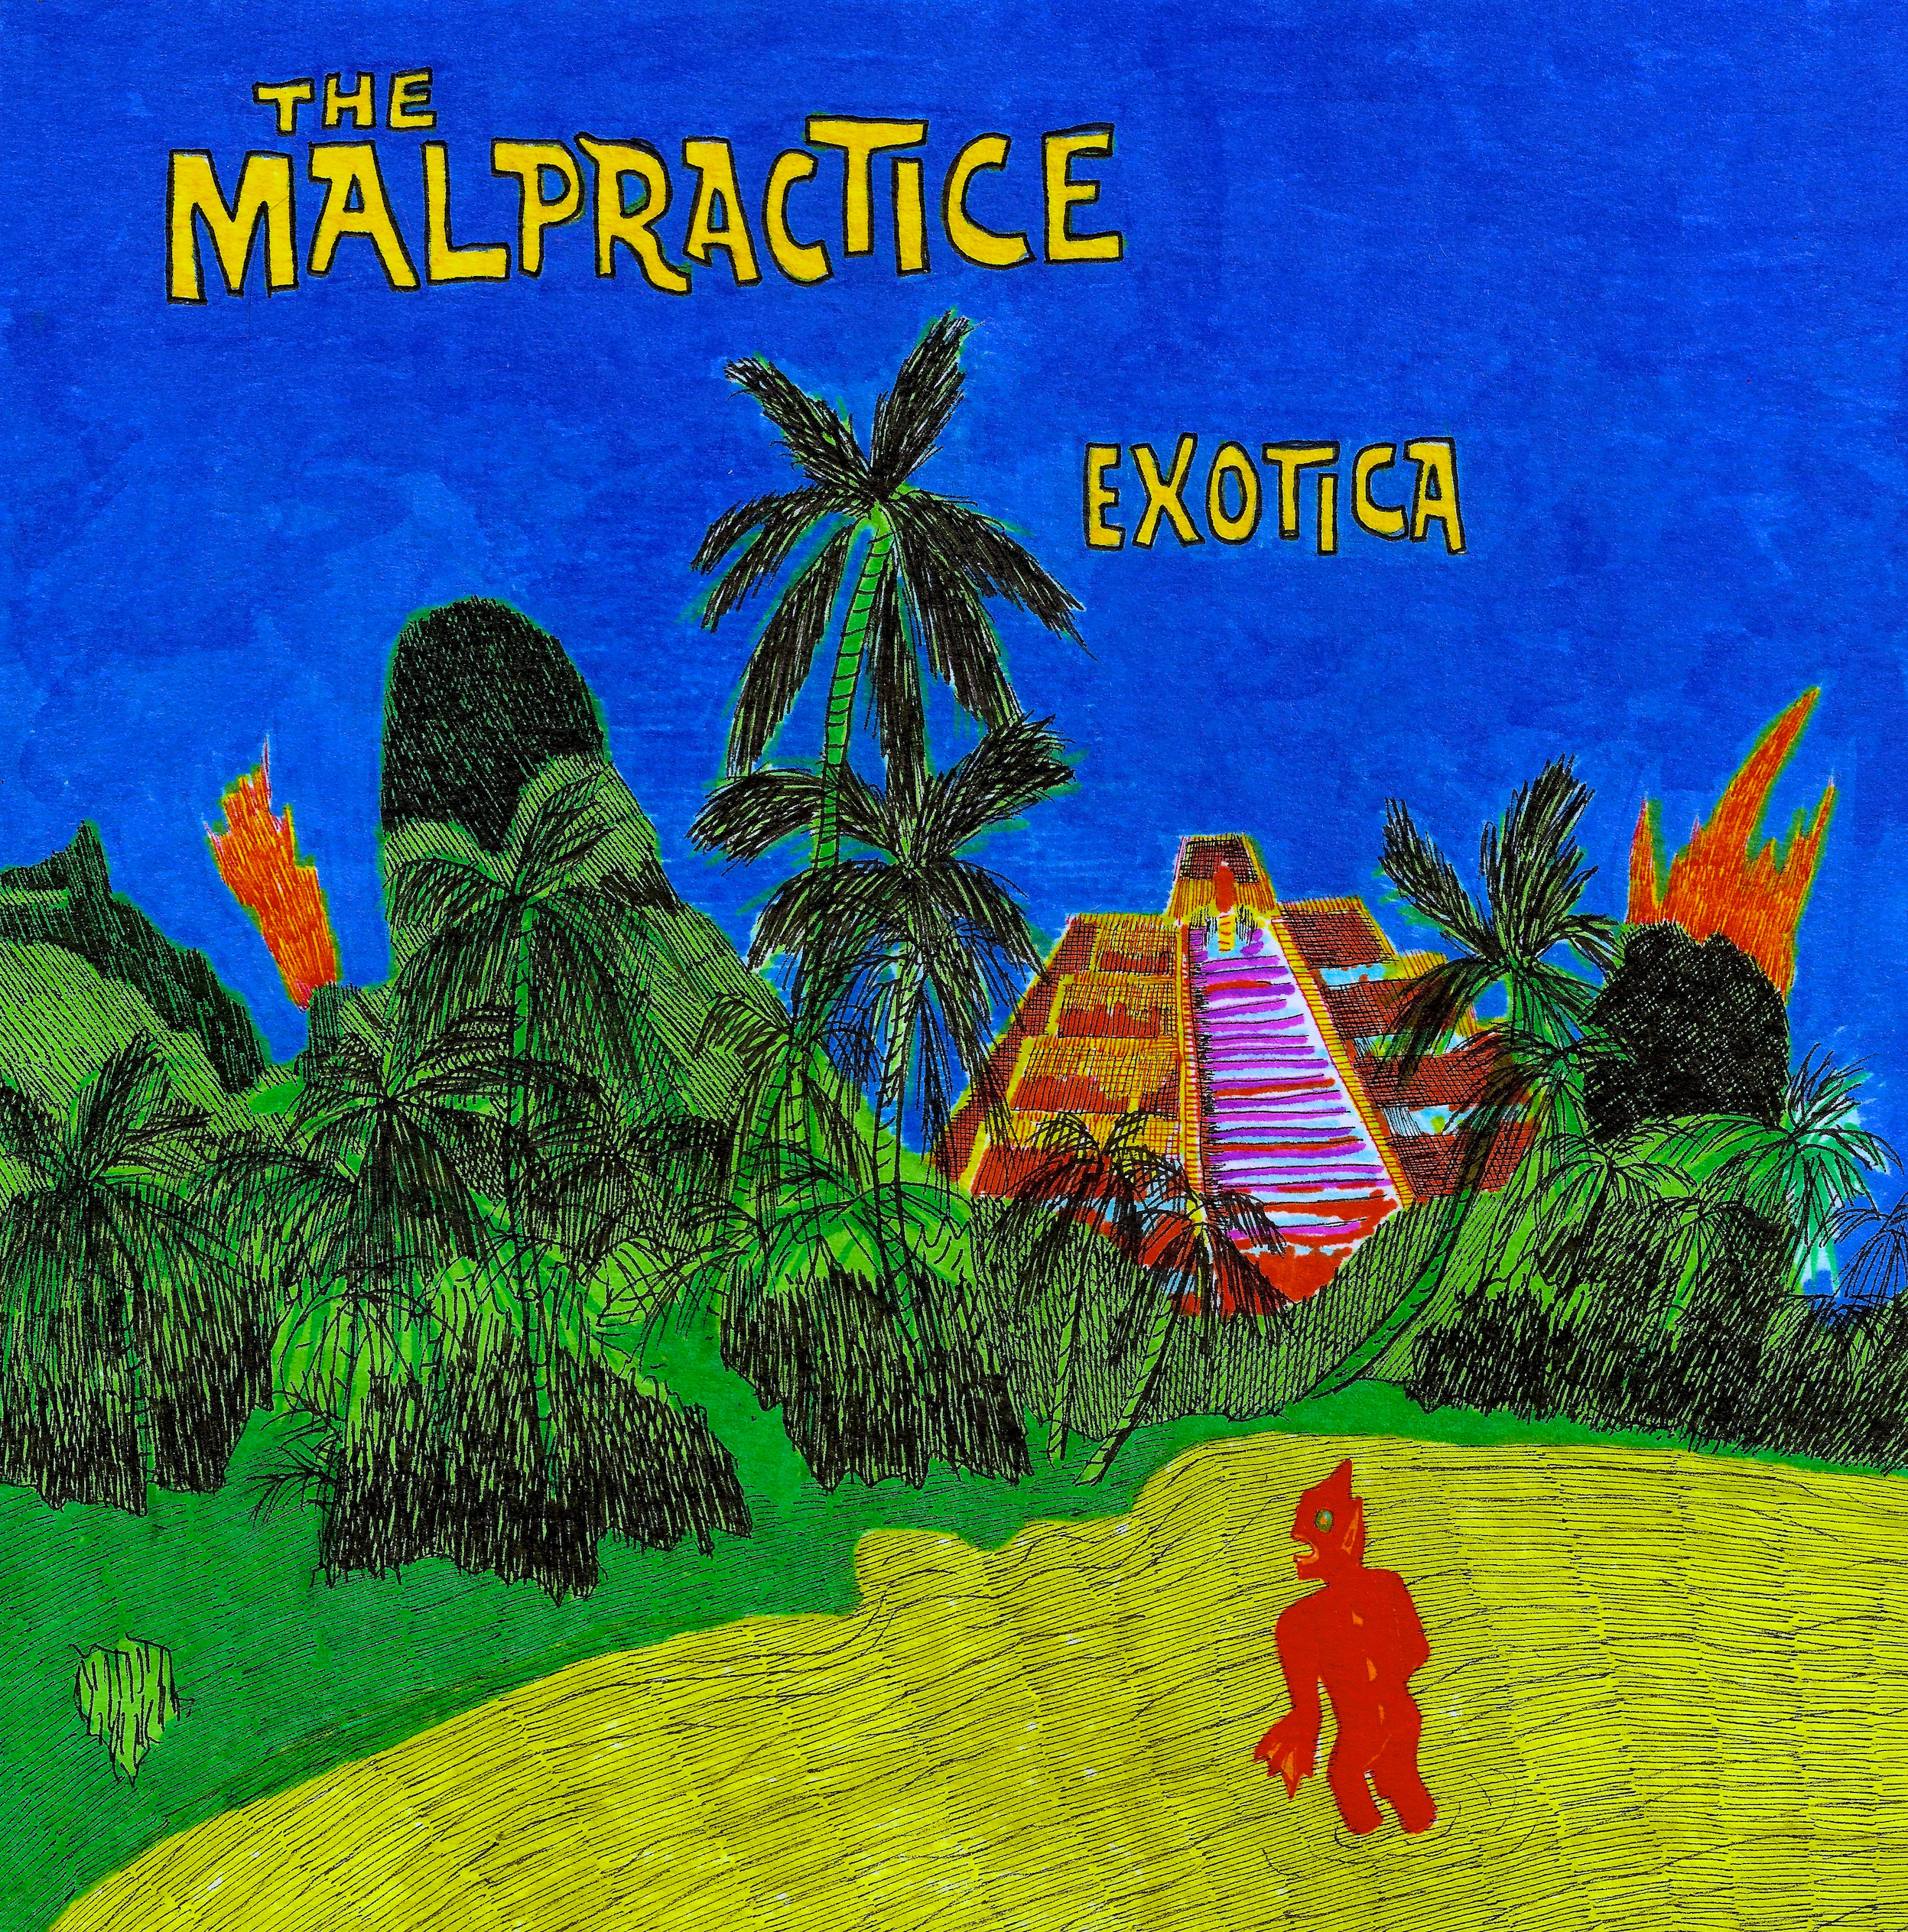 Malpractice Exotica small.jpeg